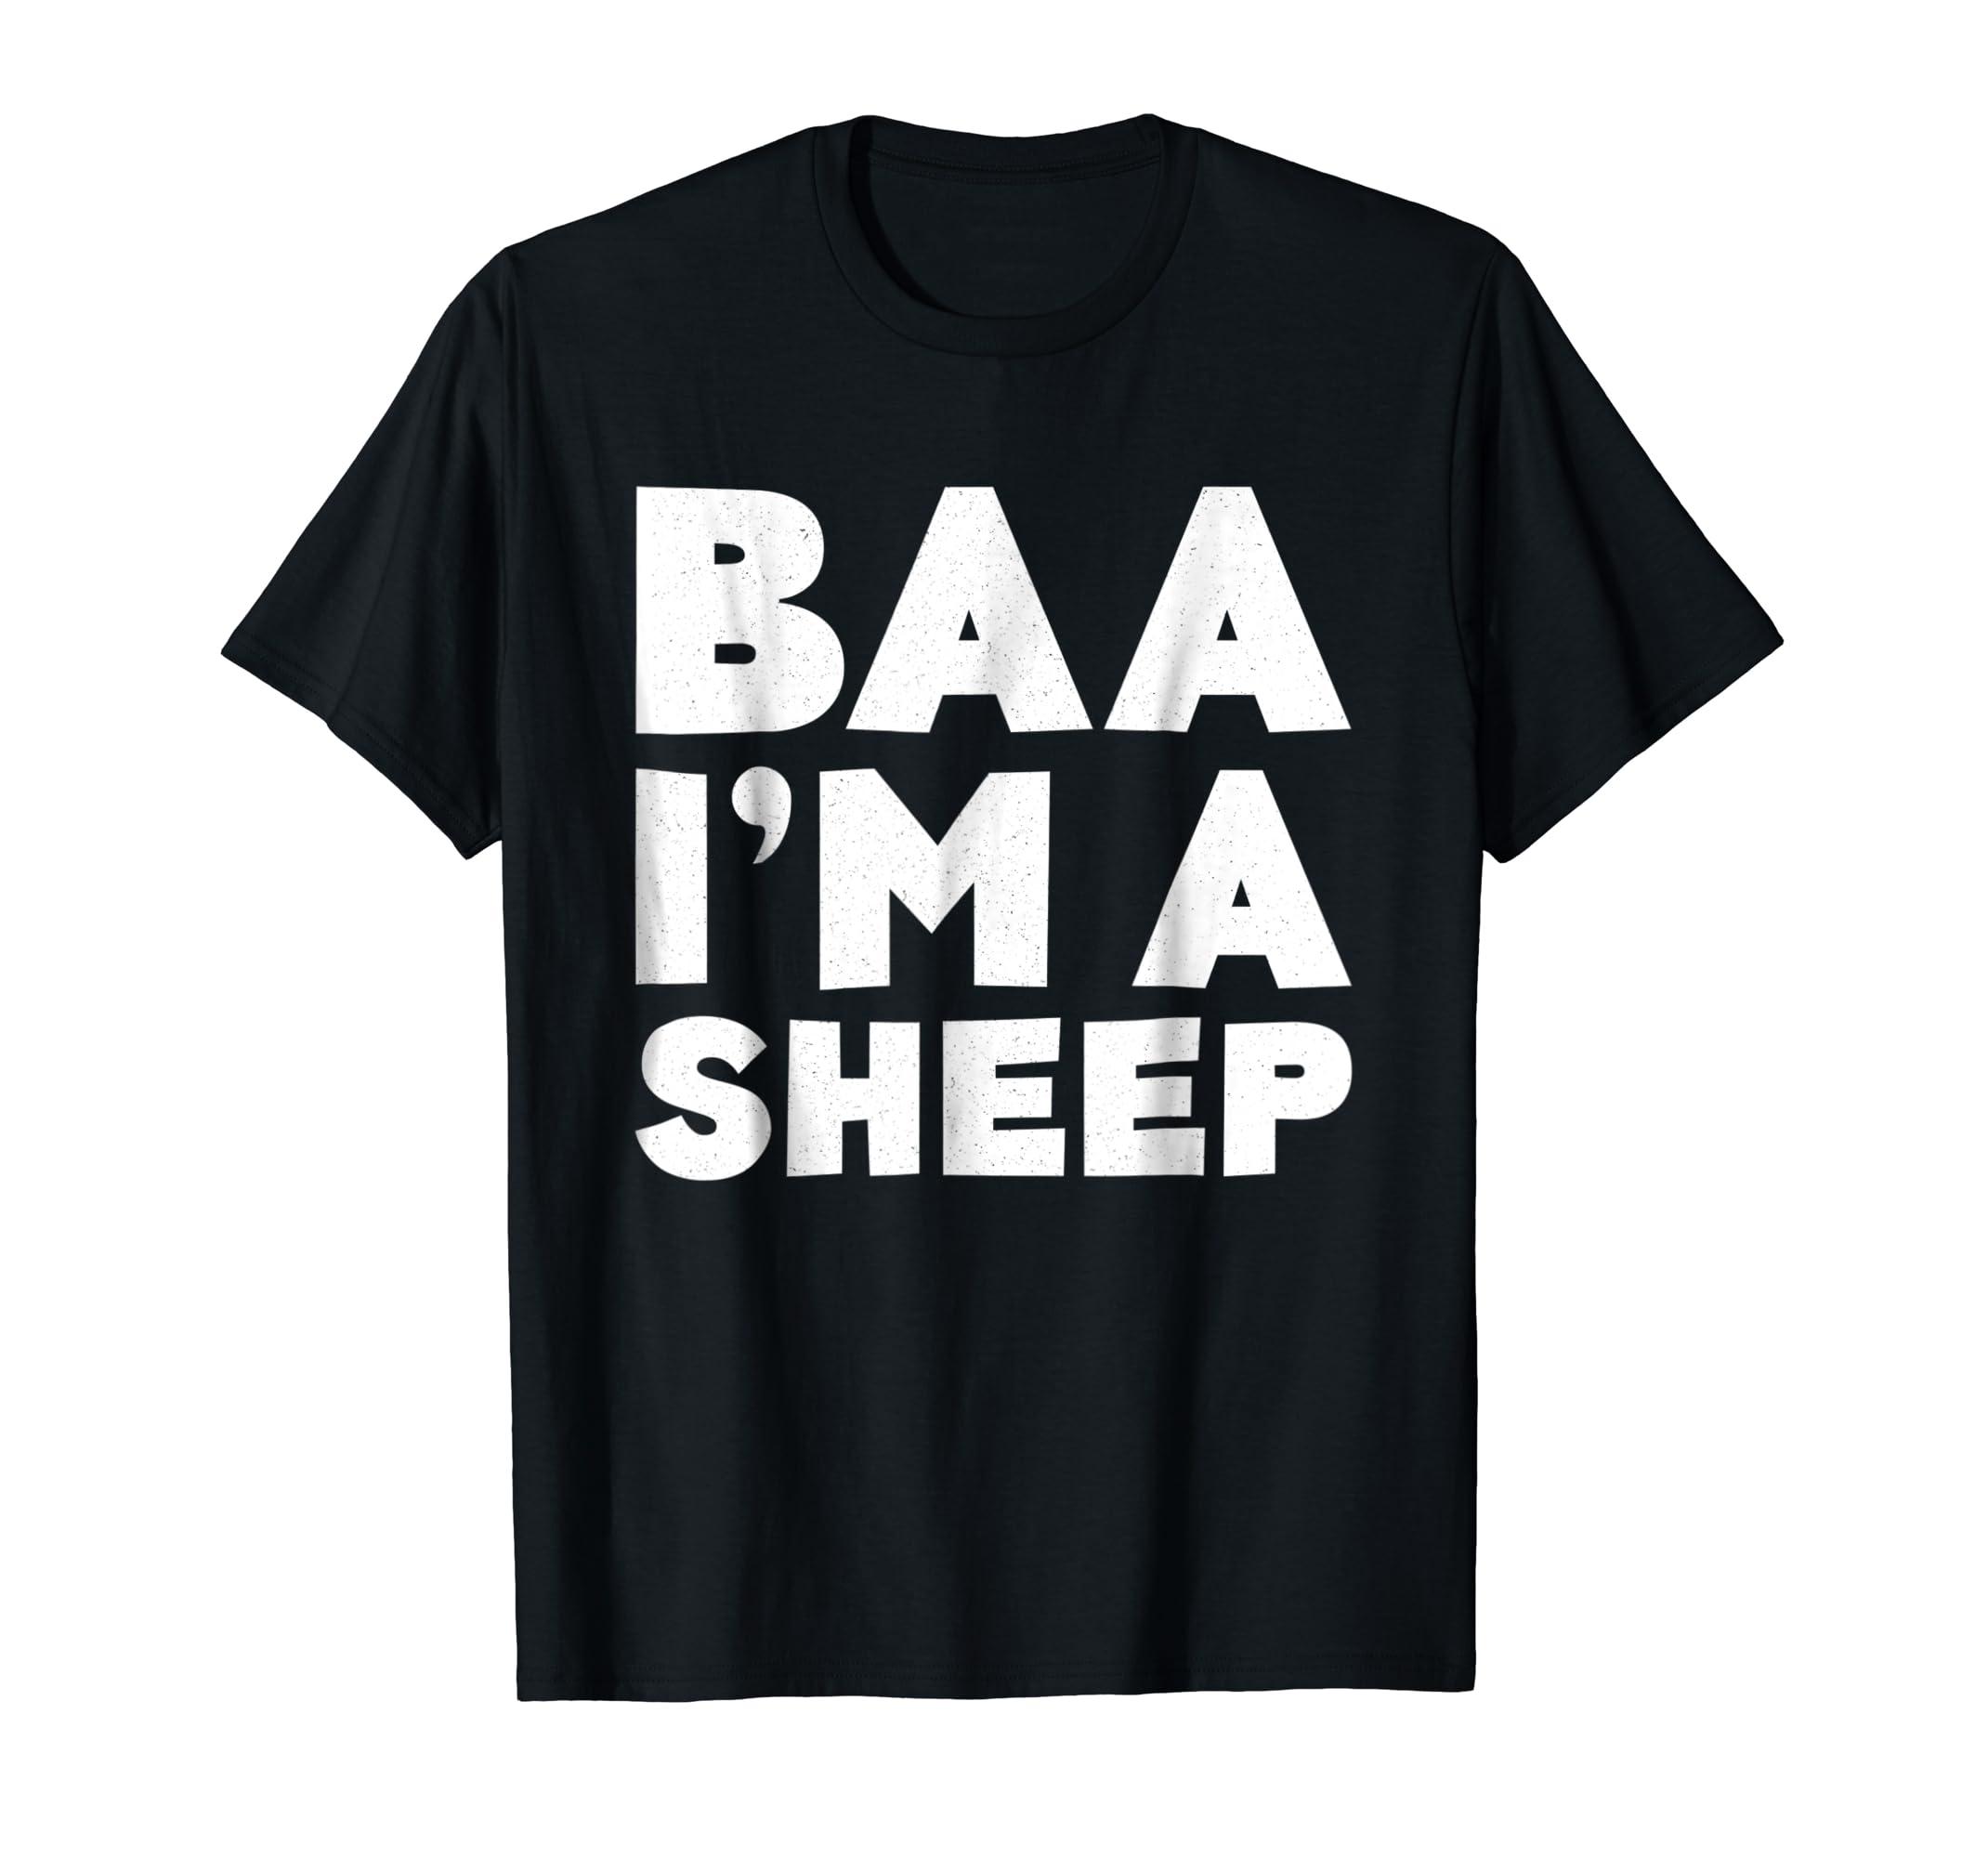 Baa I'm A Sheep T-Shirt Costume Gift Shirt-Men's T-Shirt-Black